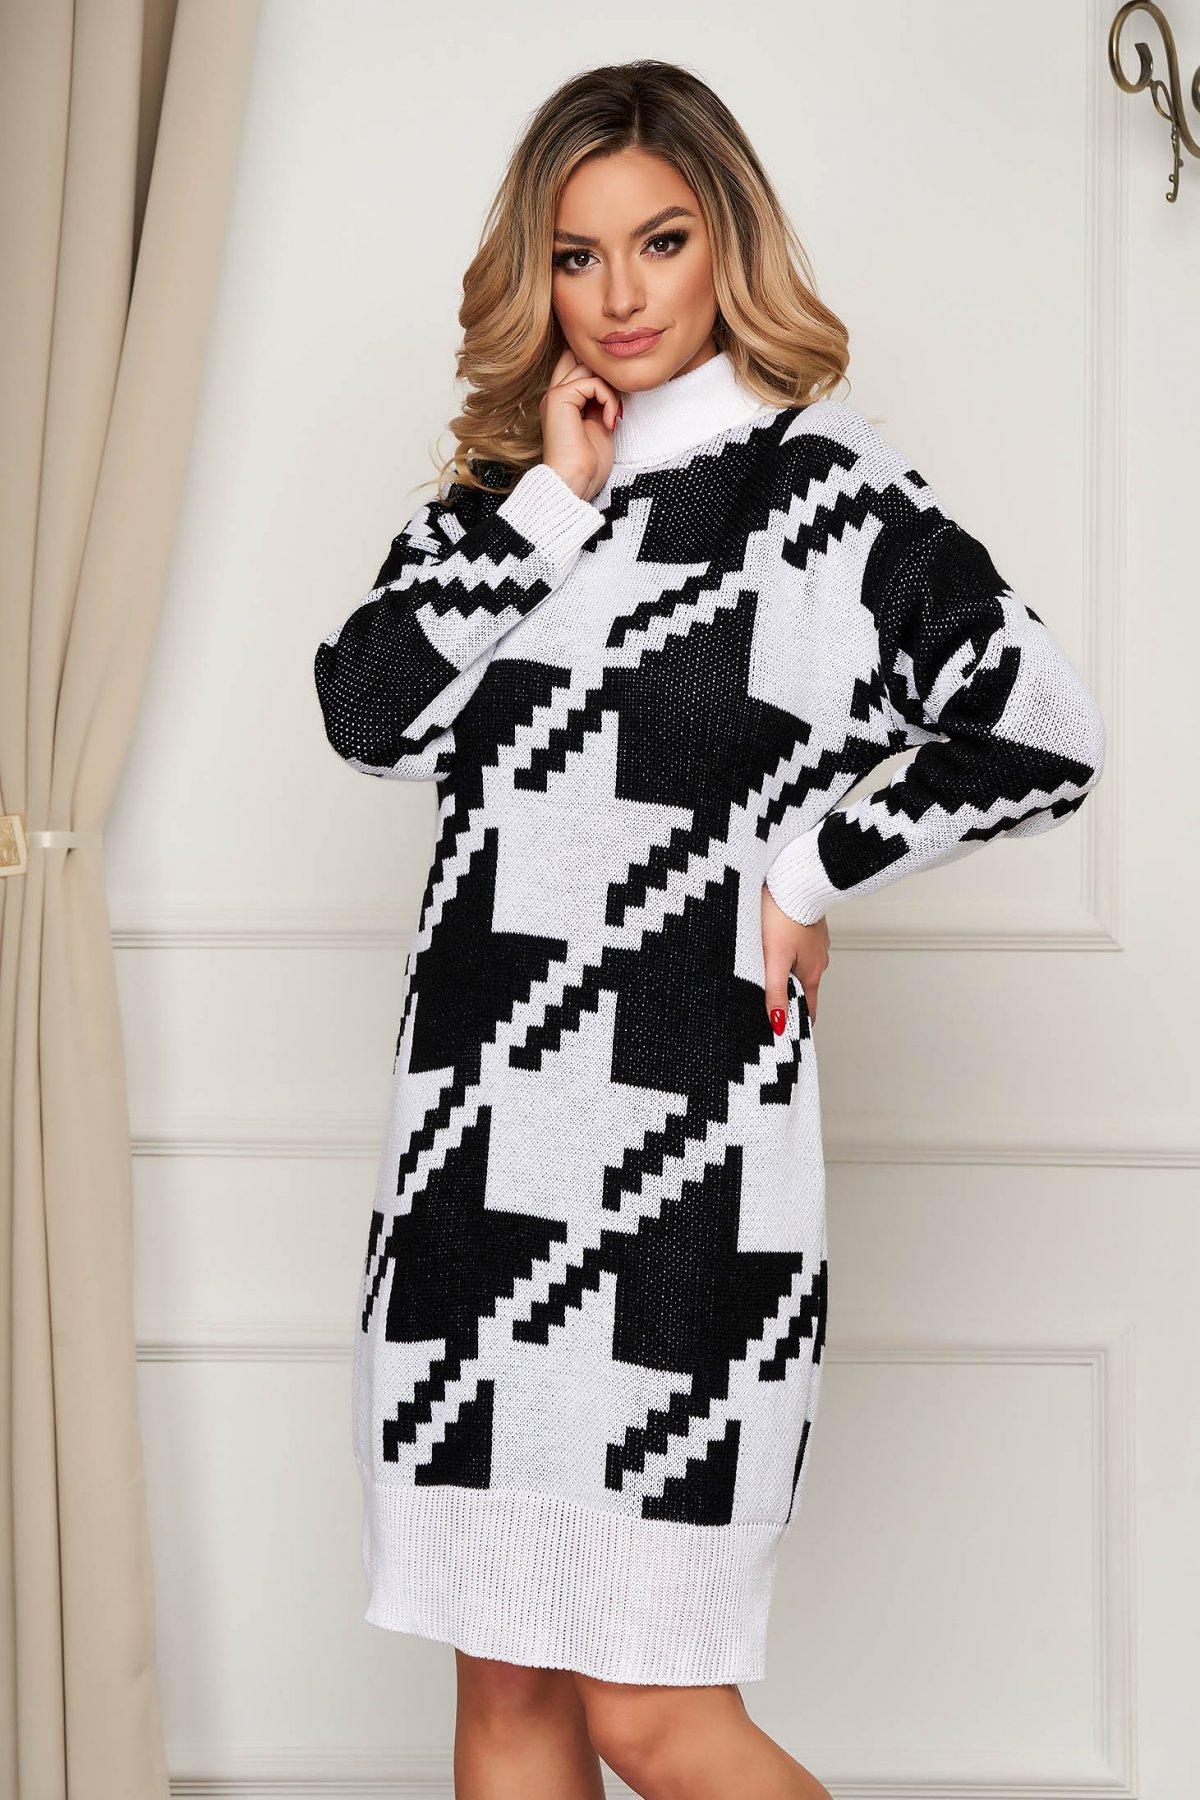 Rochie SunShine tricotata din material gros elastic pe gat cu croi larg SunShine